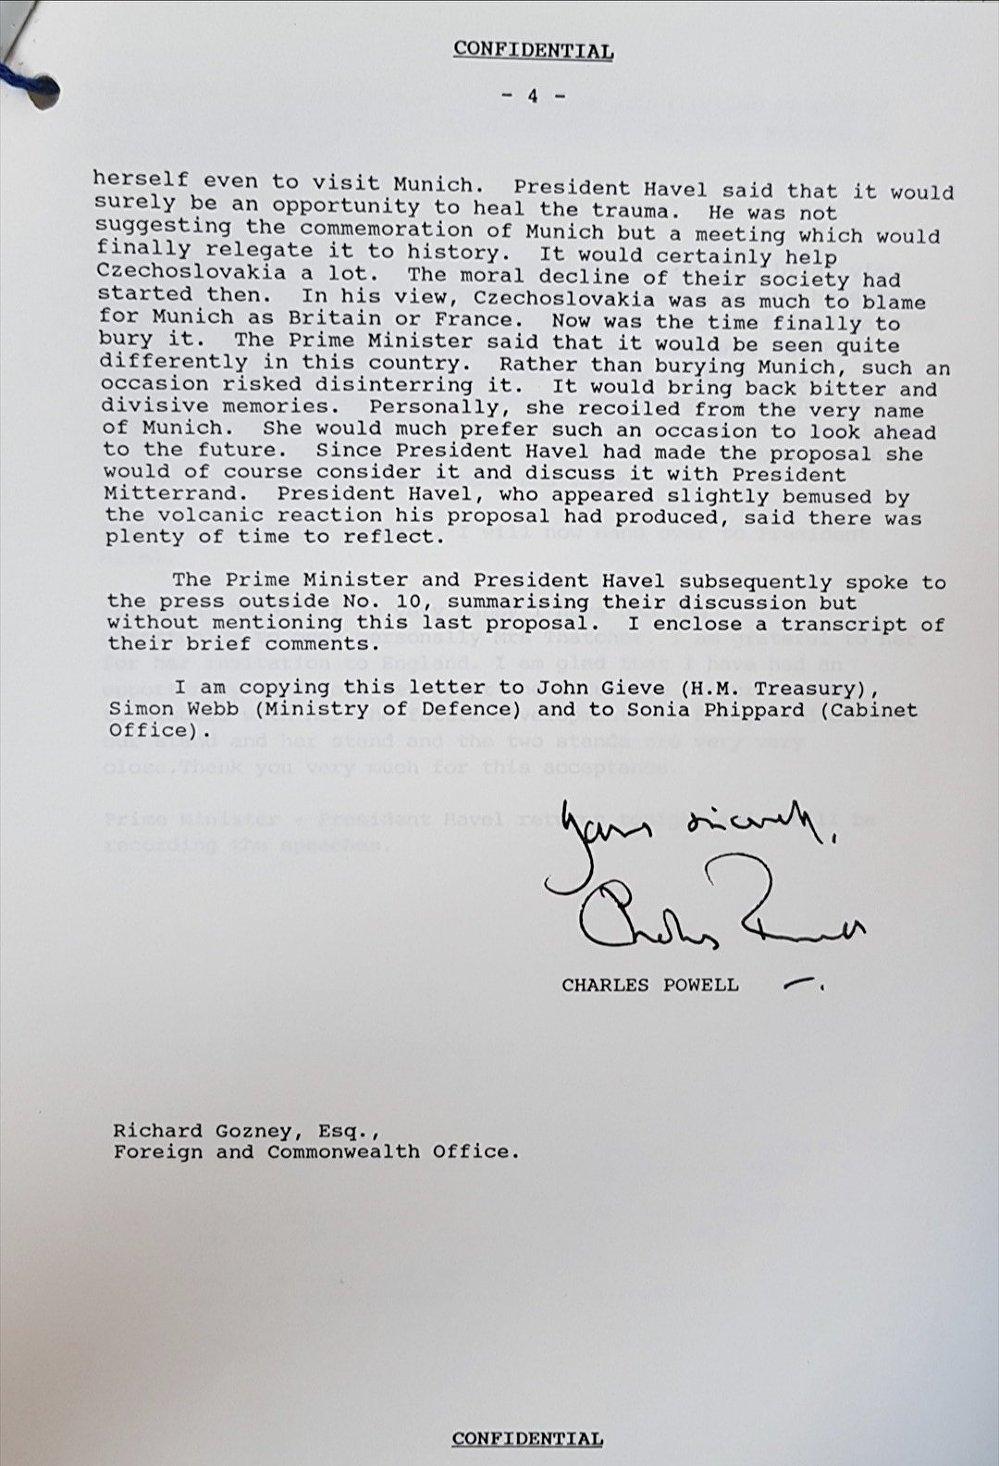 Transcript of a Thatcher-Havel conversation.